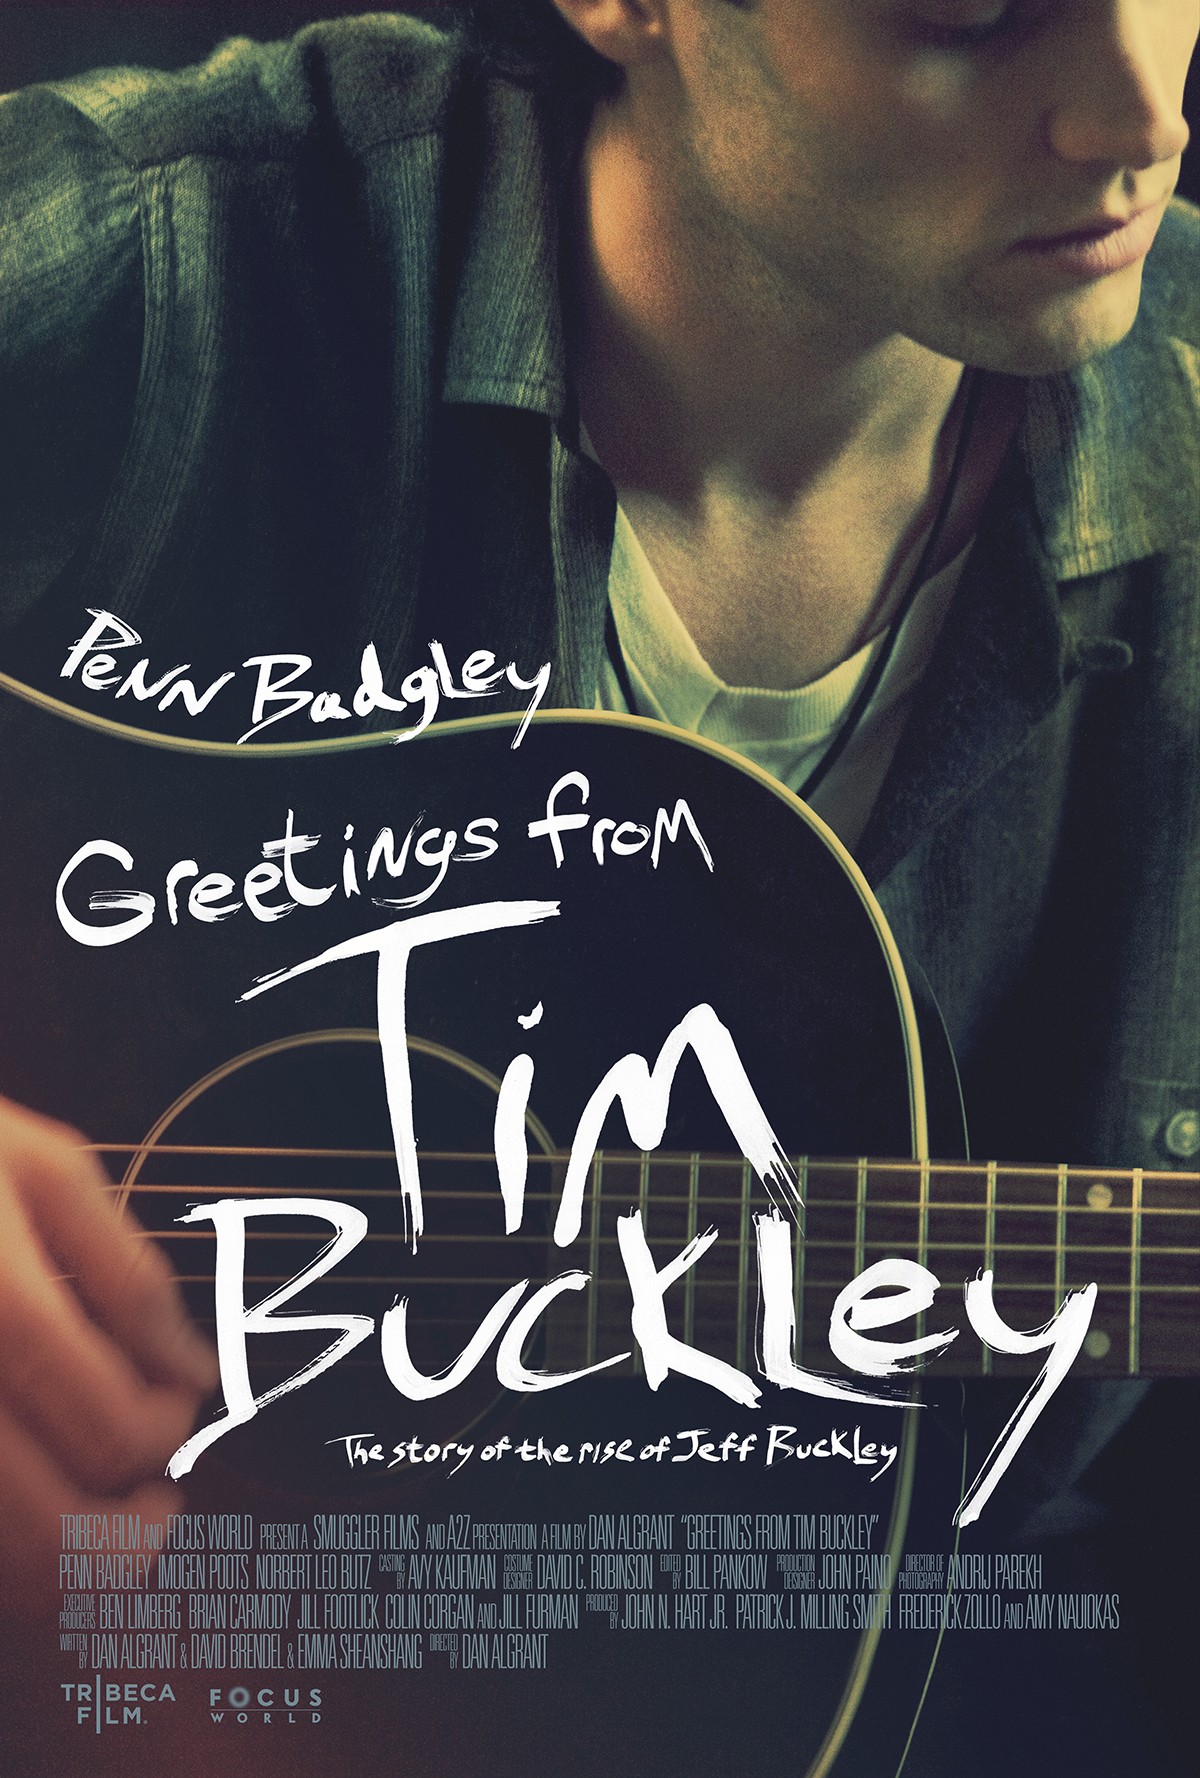 Greetings from Tim Buckley 2012 IMDb